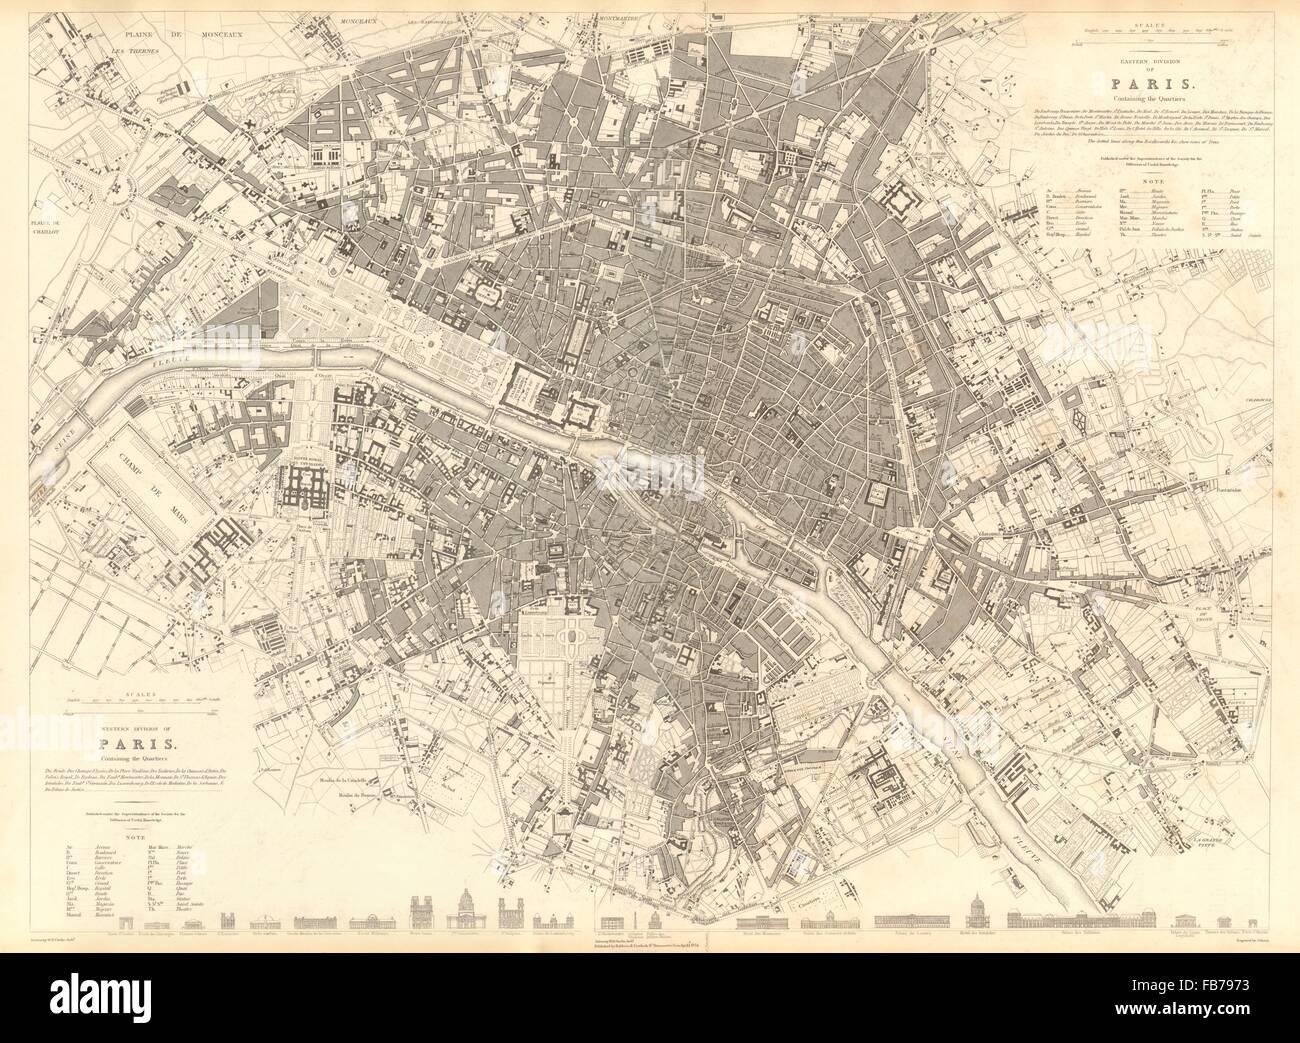 Karte Paris Stadtplan.Paris Antike Stadt Karte Stadtplan Großen 55 X 40 Cm Sduk 1848